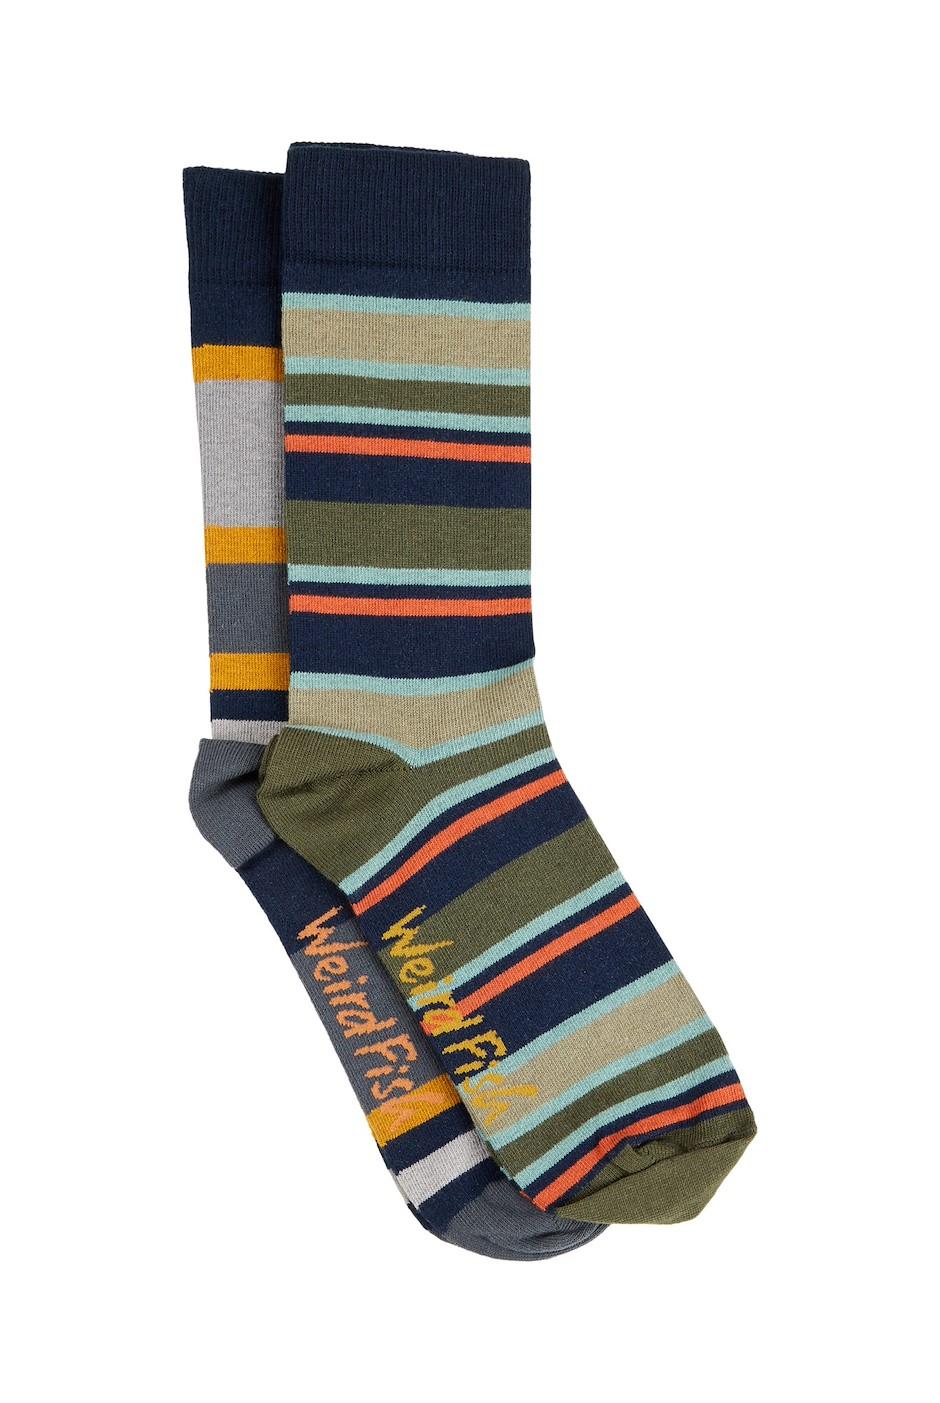 Doolin Sock Set 2 Pair Pack Navy